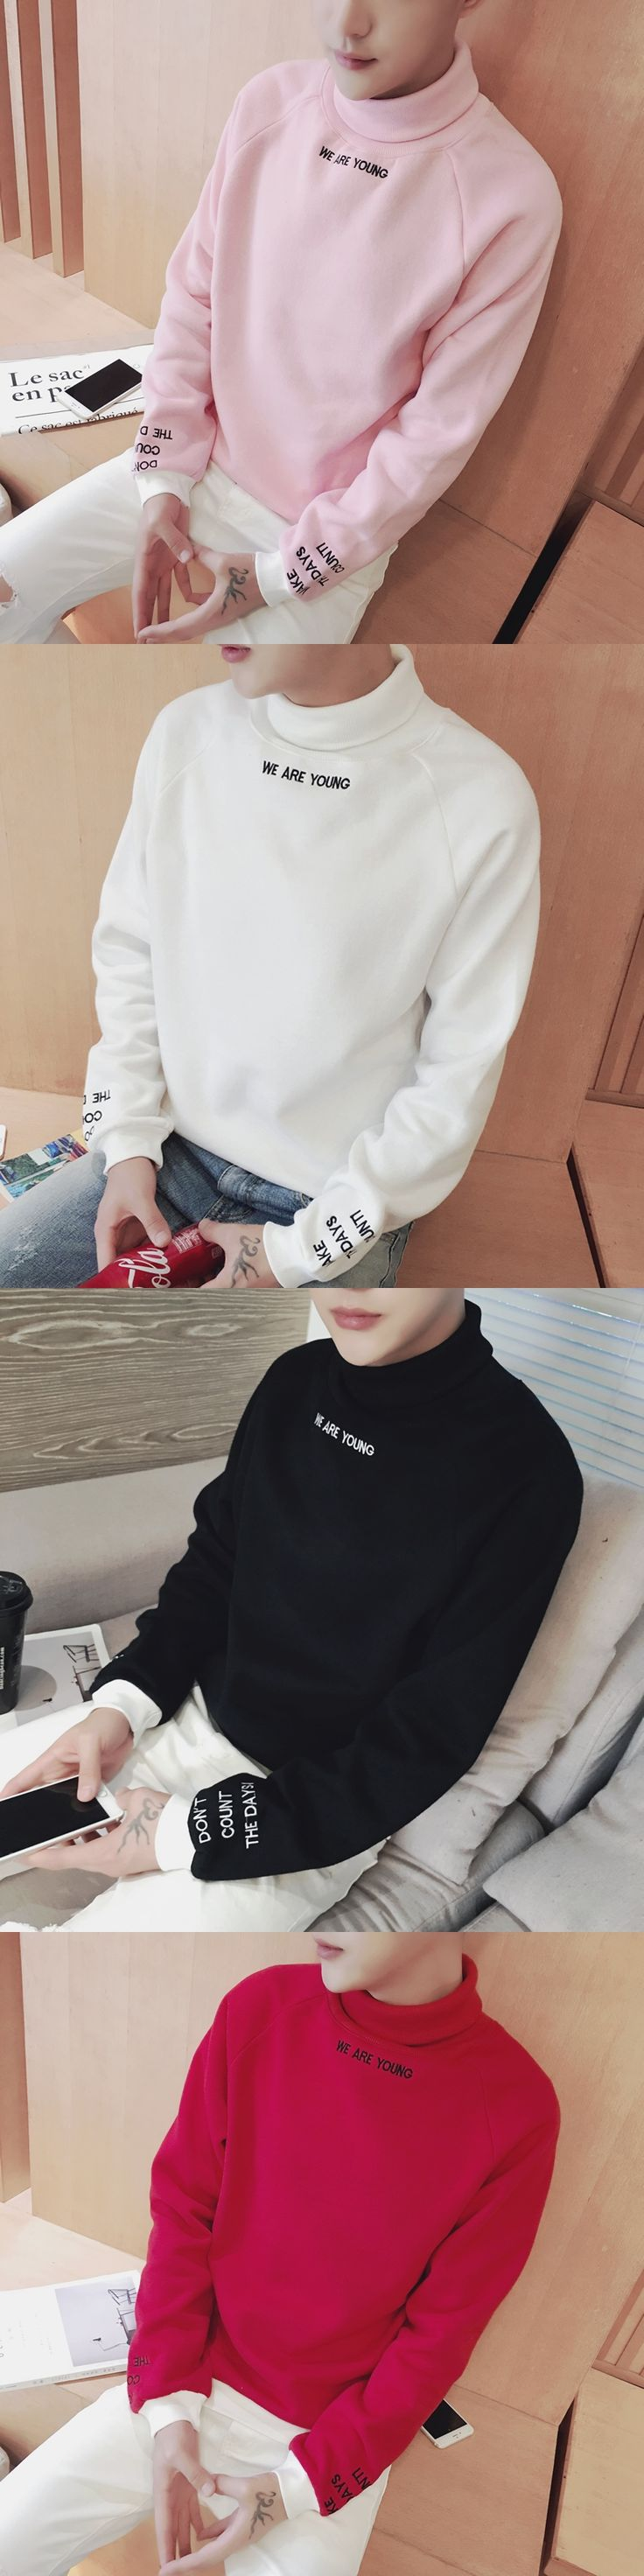 "New Fashion Irregular Design Boys Hoodies Men Turtleneck Casual Hoodie Undershirt Letter ""We are young"" Embroidery Sweatshirt"